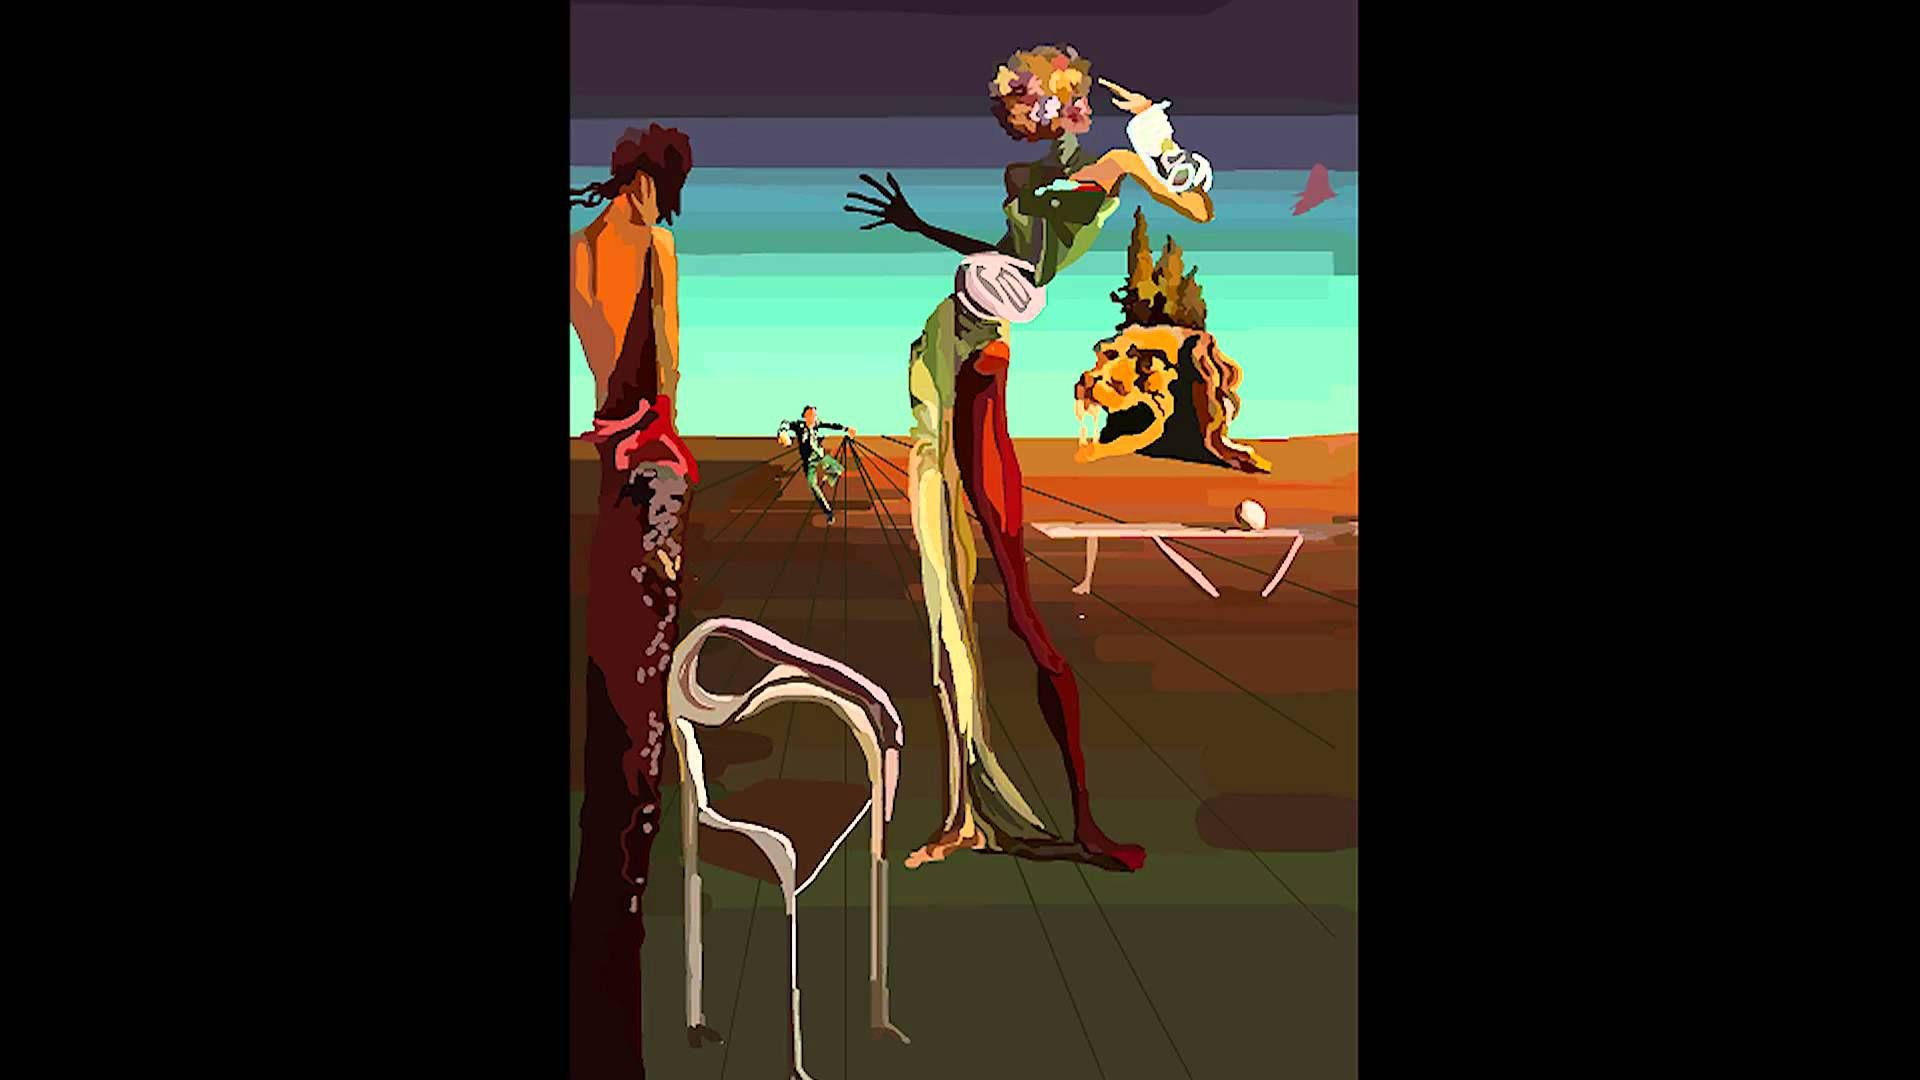 Salvador Dali Painting Comes To Life Con Imagenes